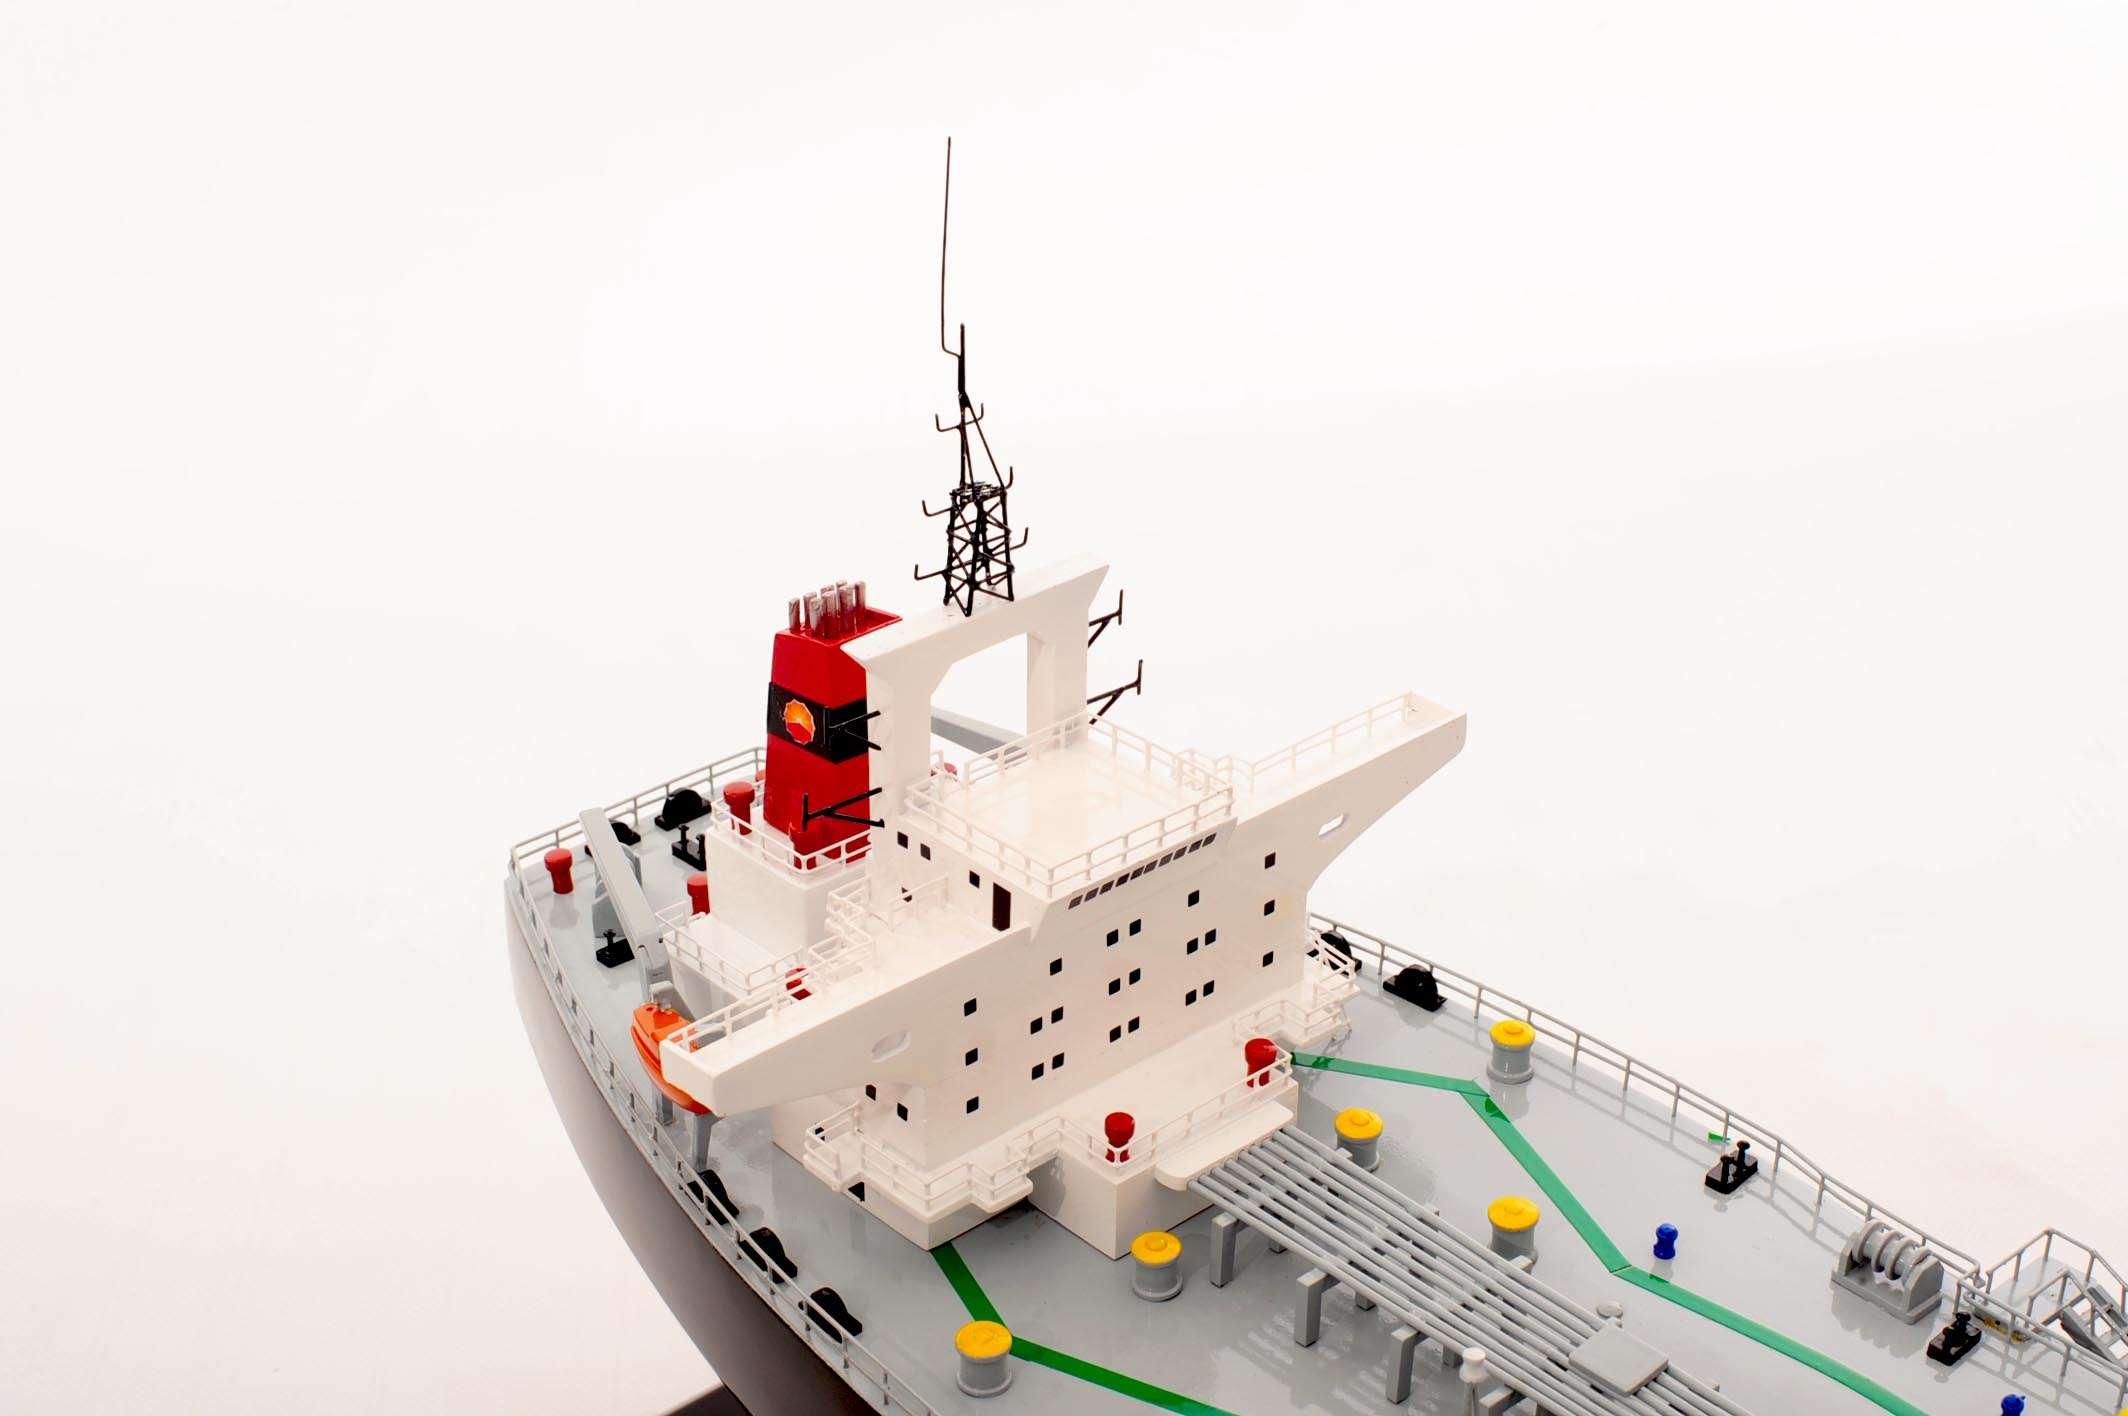 1475-4414-Very-Large-Crude-Oil-VLCC-Tanker